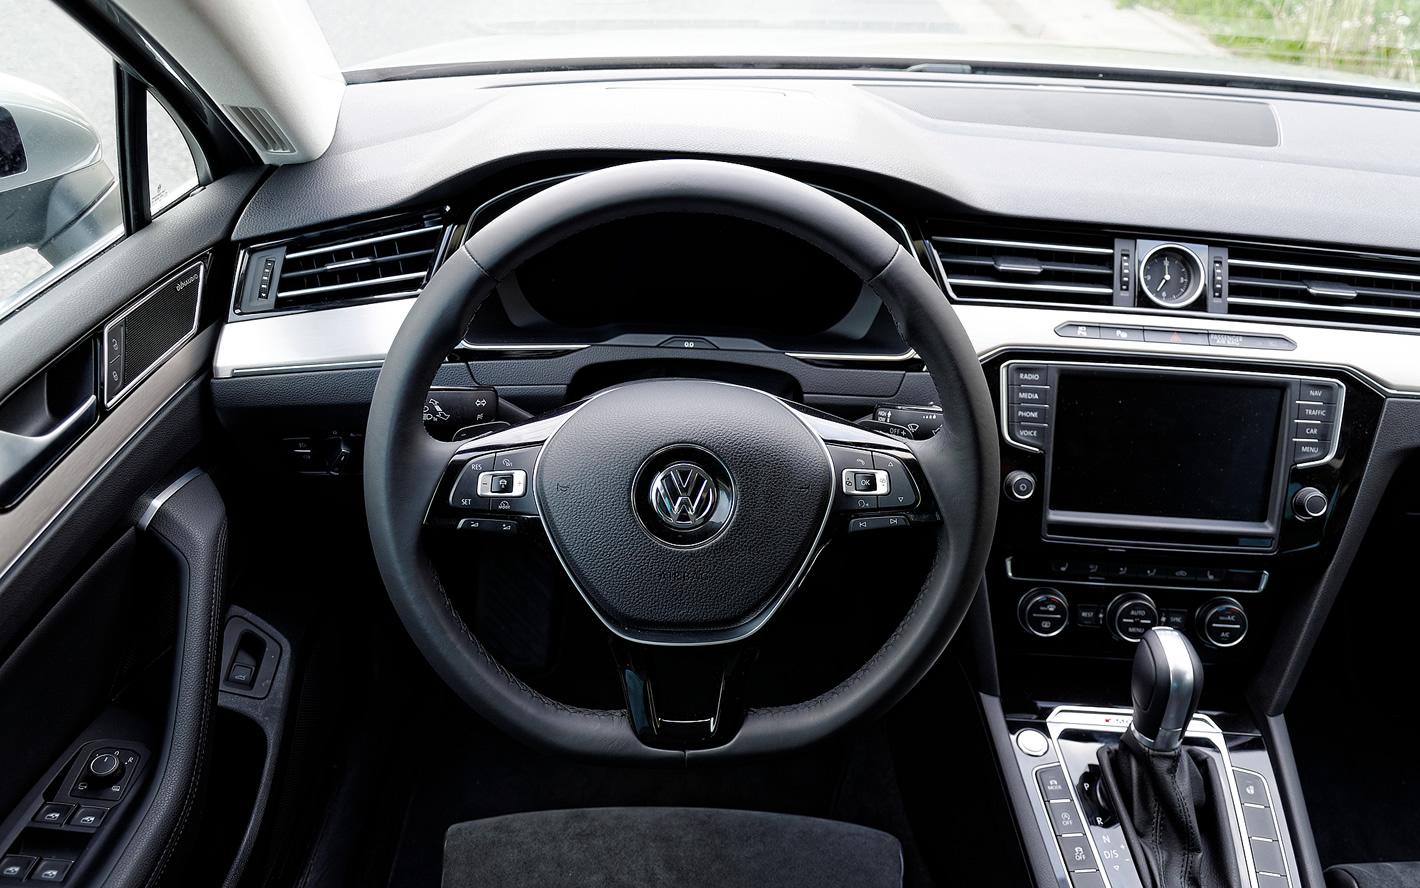 Wielofunkcyjna kierownica w Volkswagen Passat 2.0 TSI 4Motion